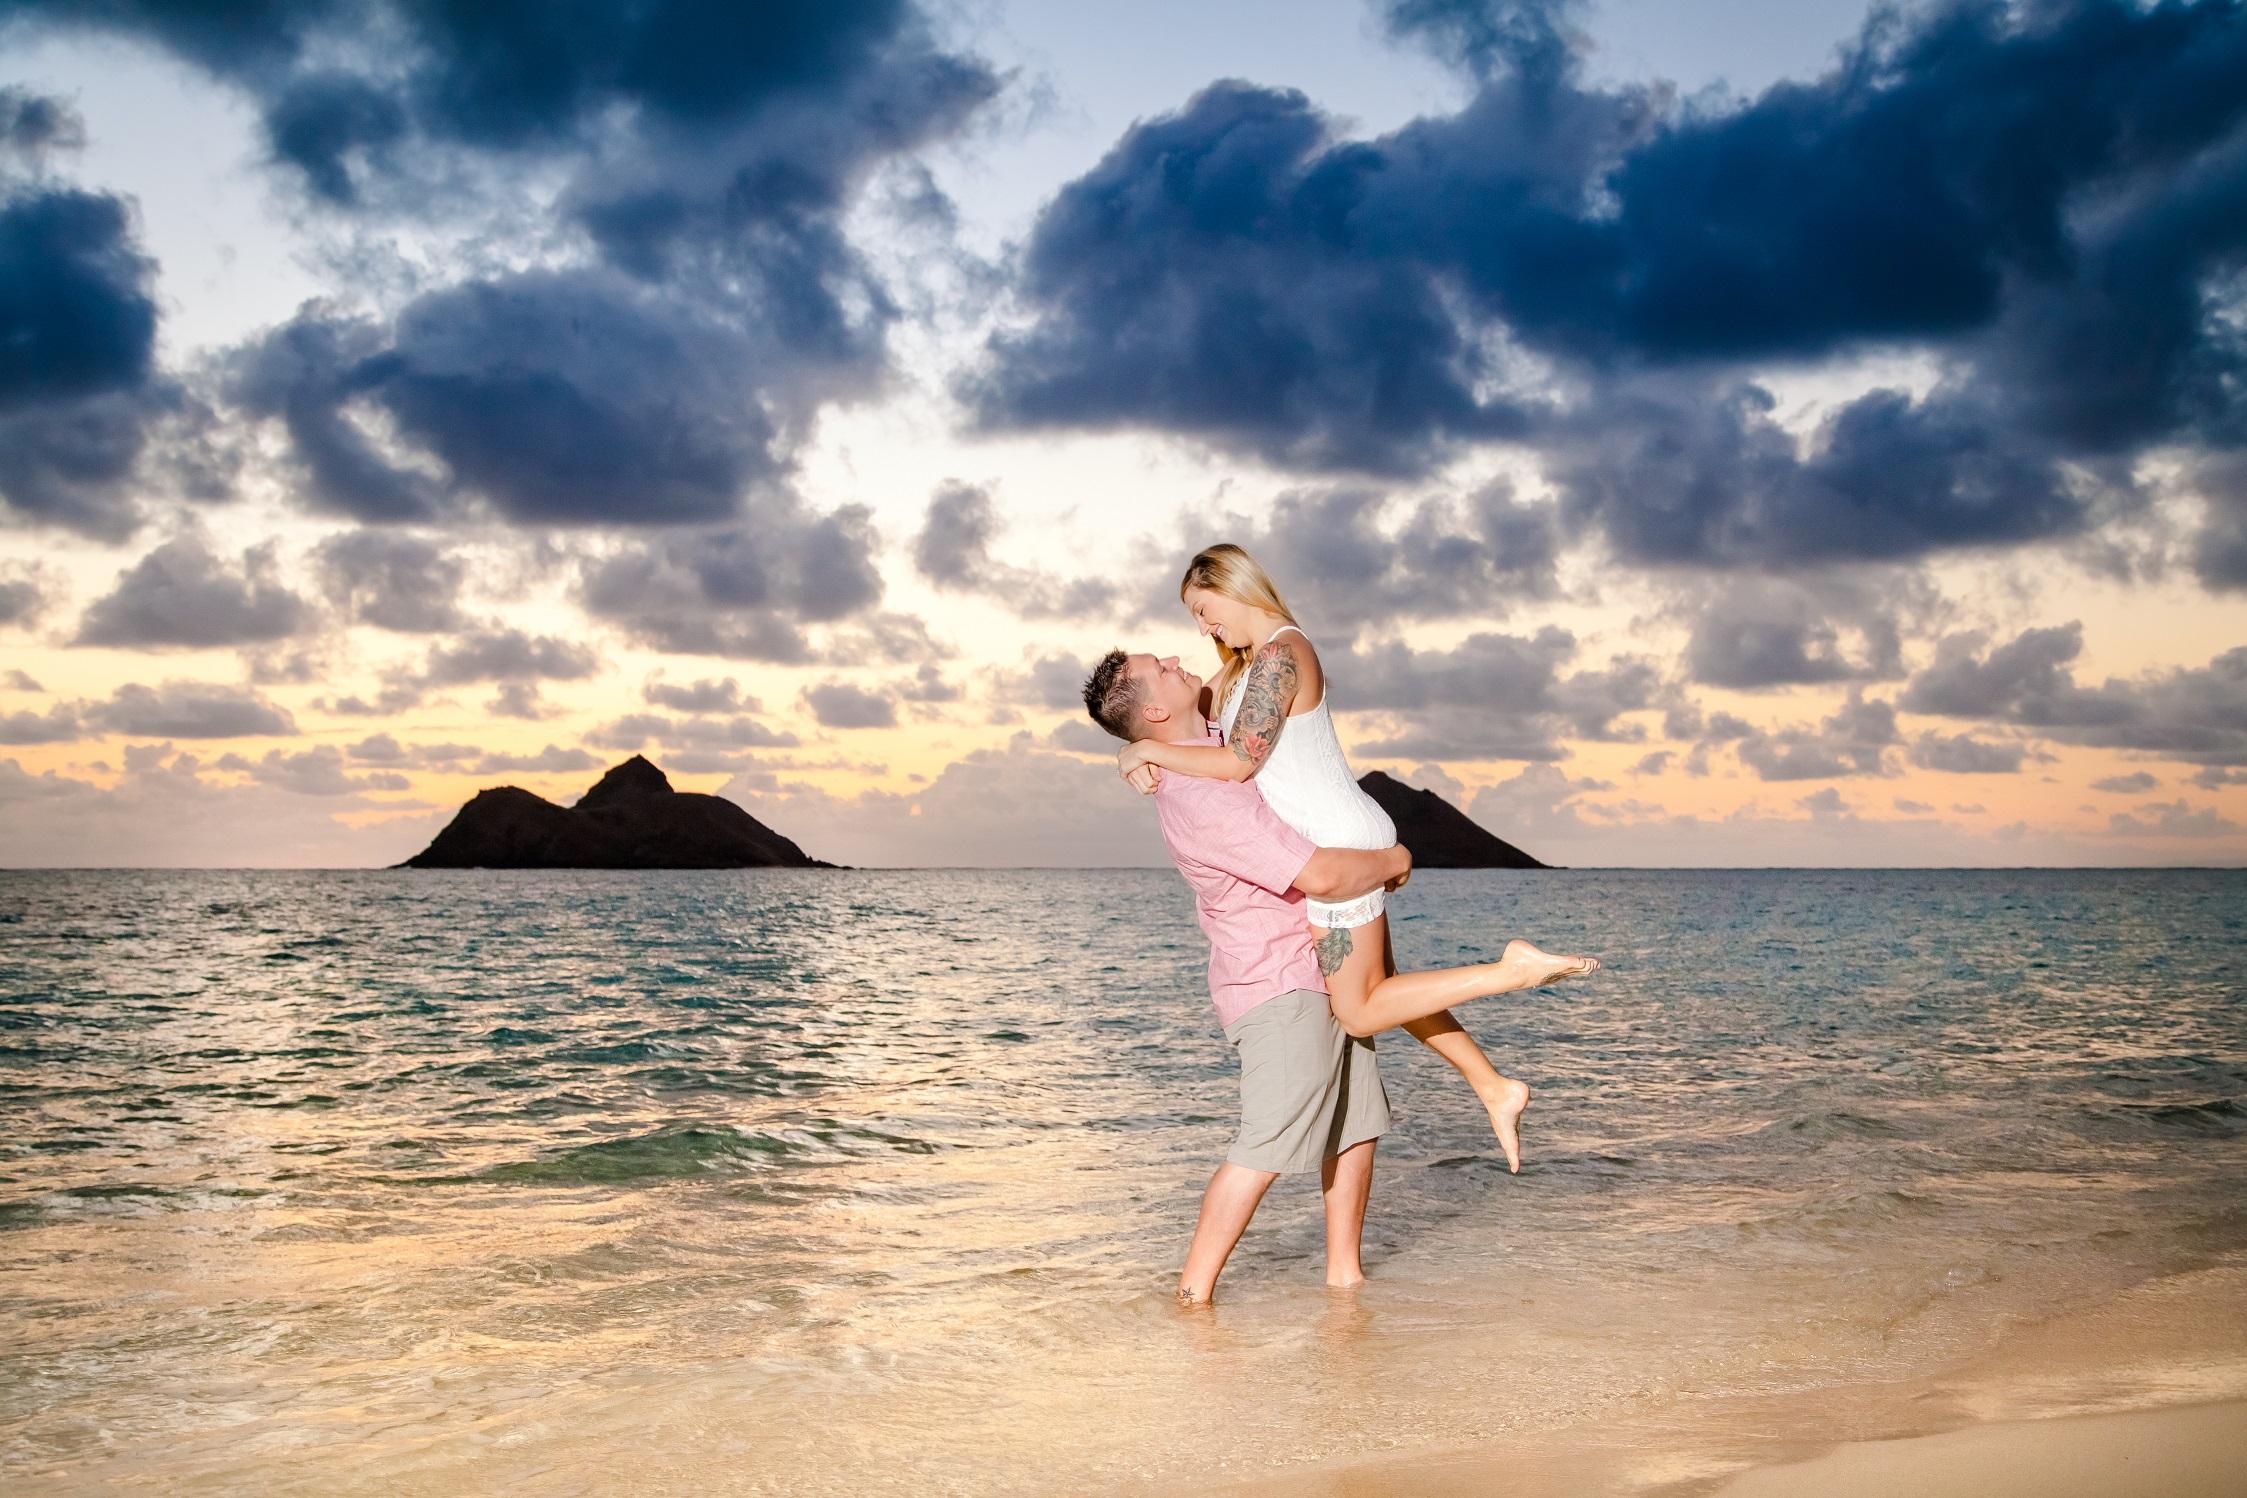 Family & Couples Beach Sunset Photographer - Oahu Pro Photography